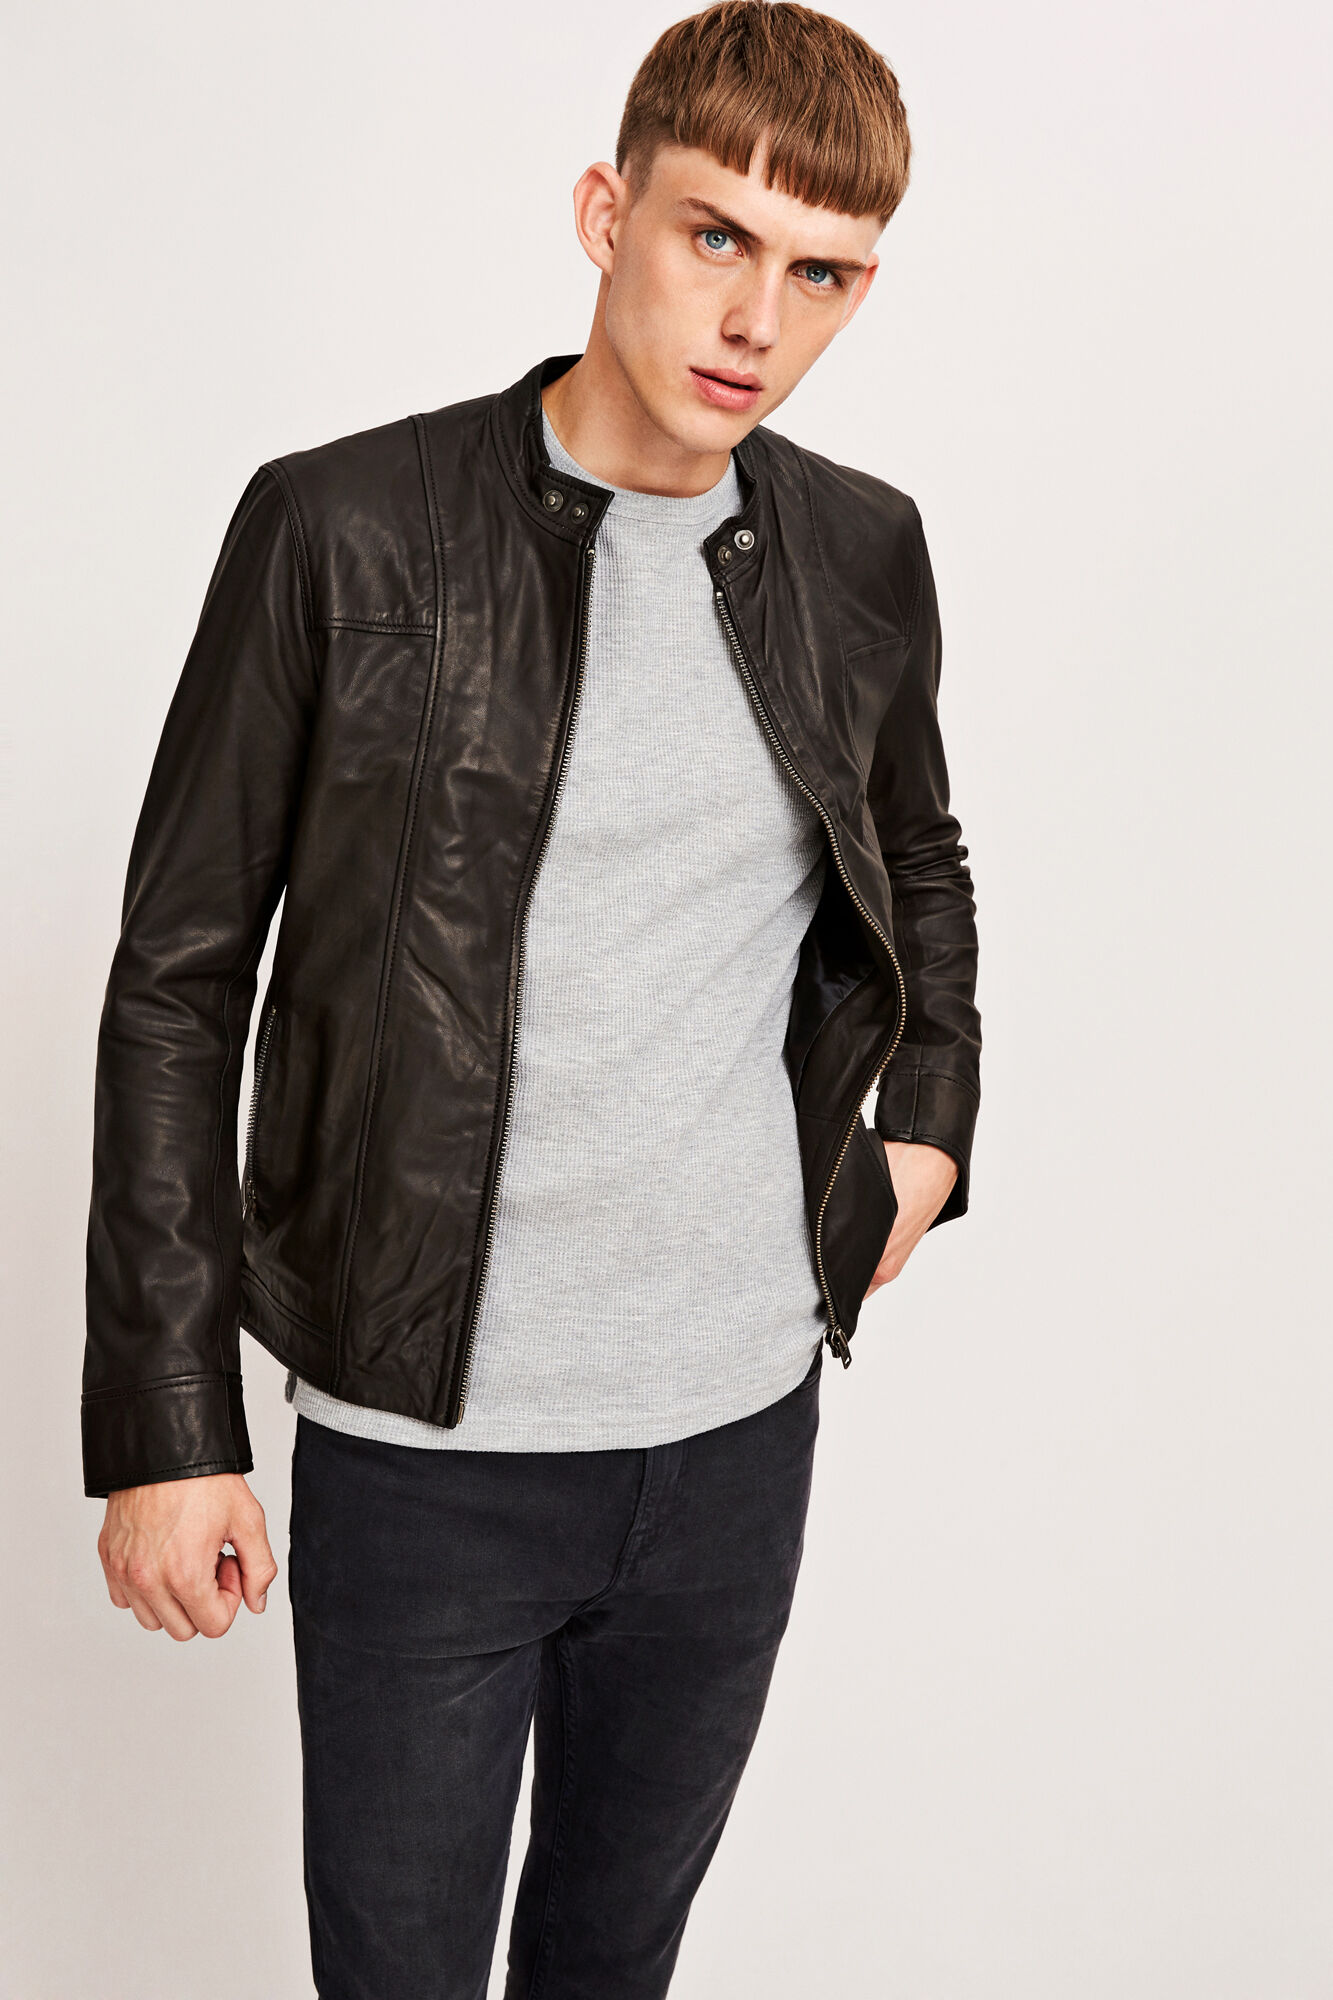 Krede jacket 1440